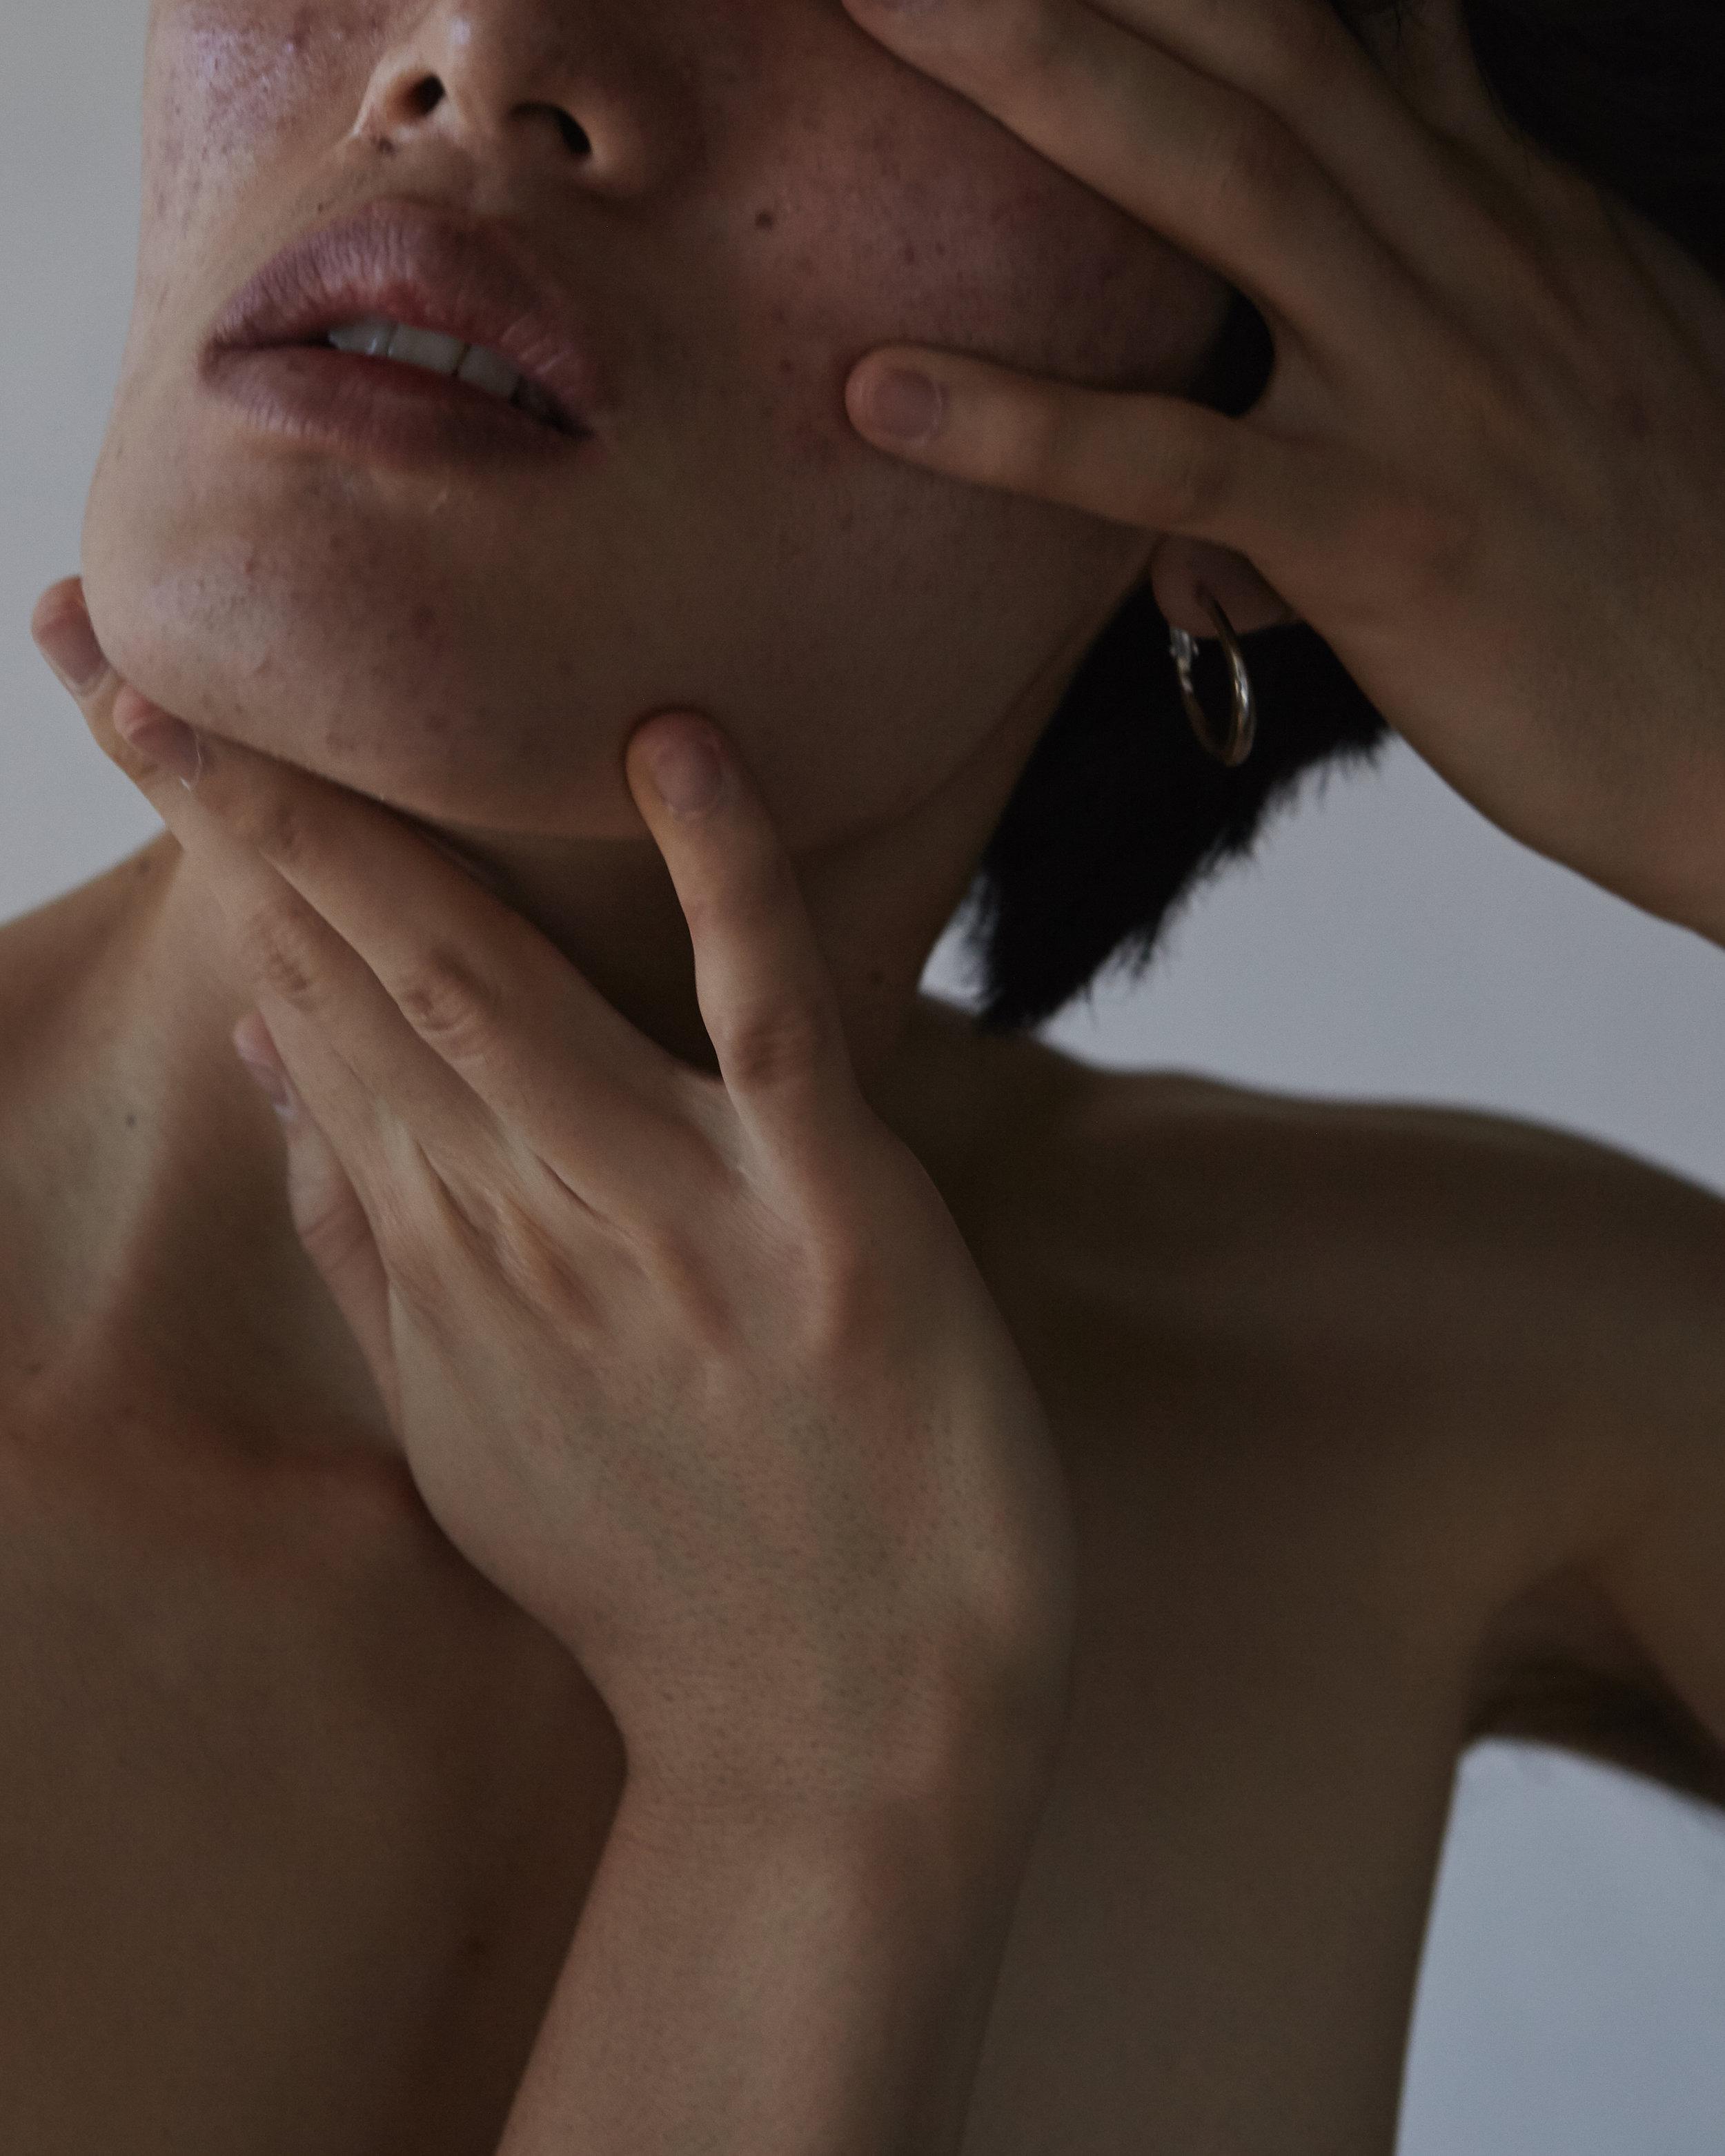 undressed_009.jpg